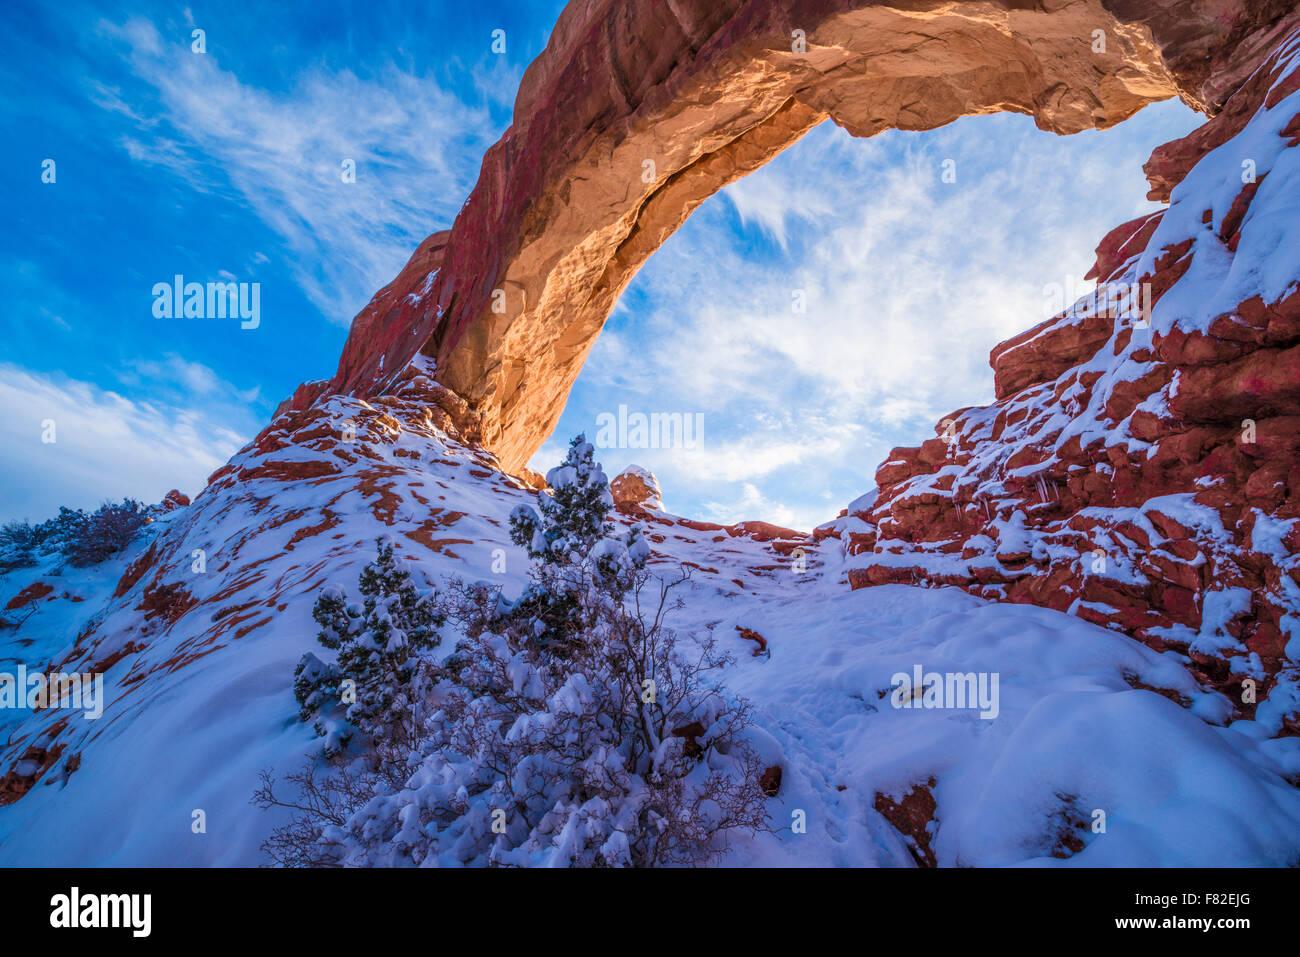 "Verschneite Sonnenuntergang am Fenster ""Norden"" Arches National Park, Utah Windows Abschnitt Stockbild"